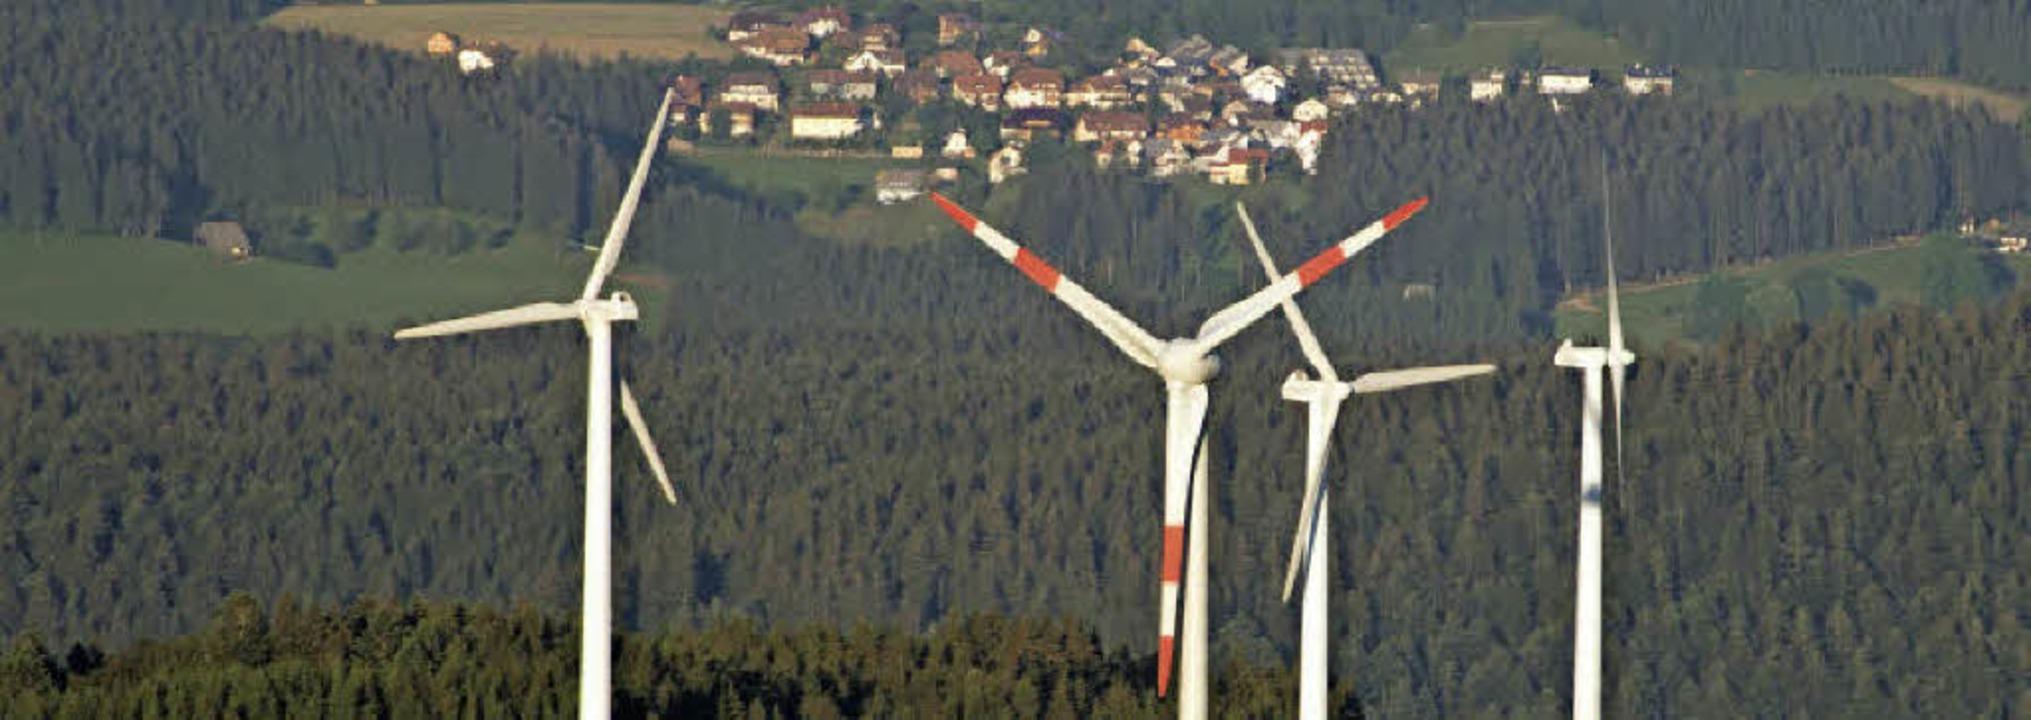 windkrafträder pro und contra